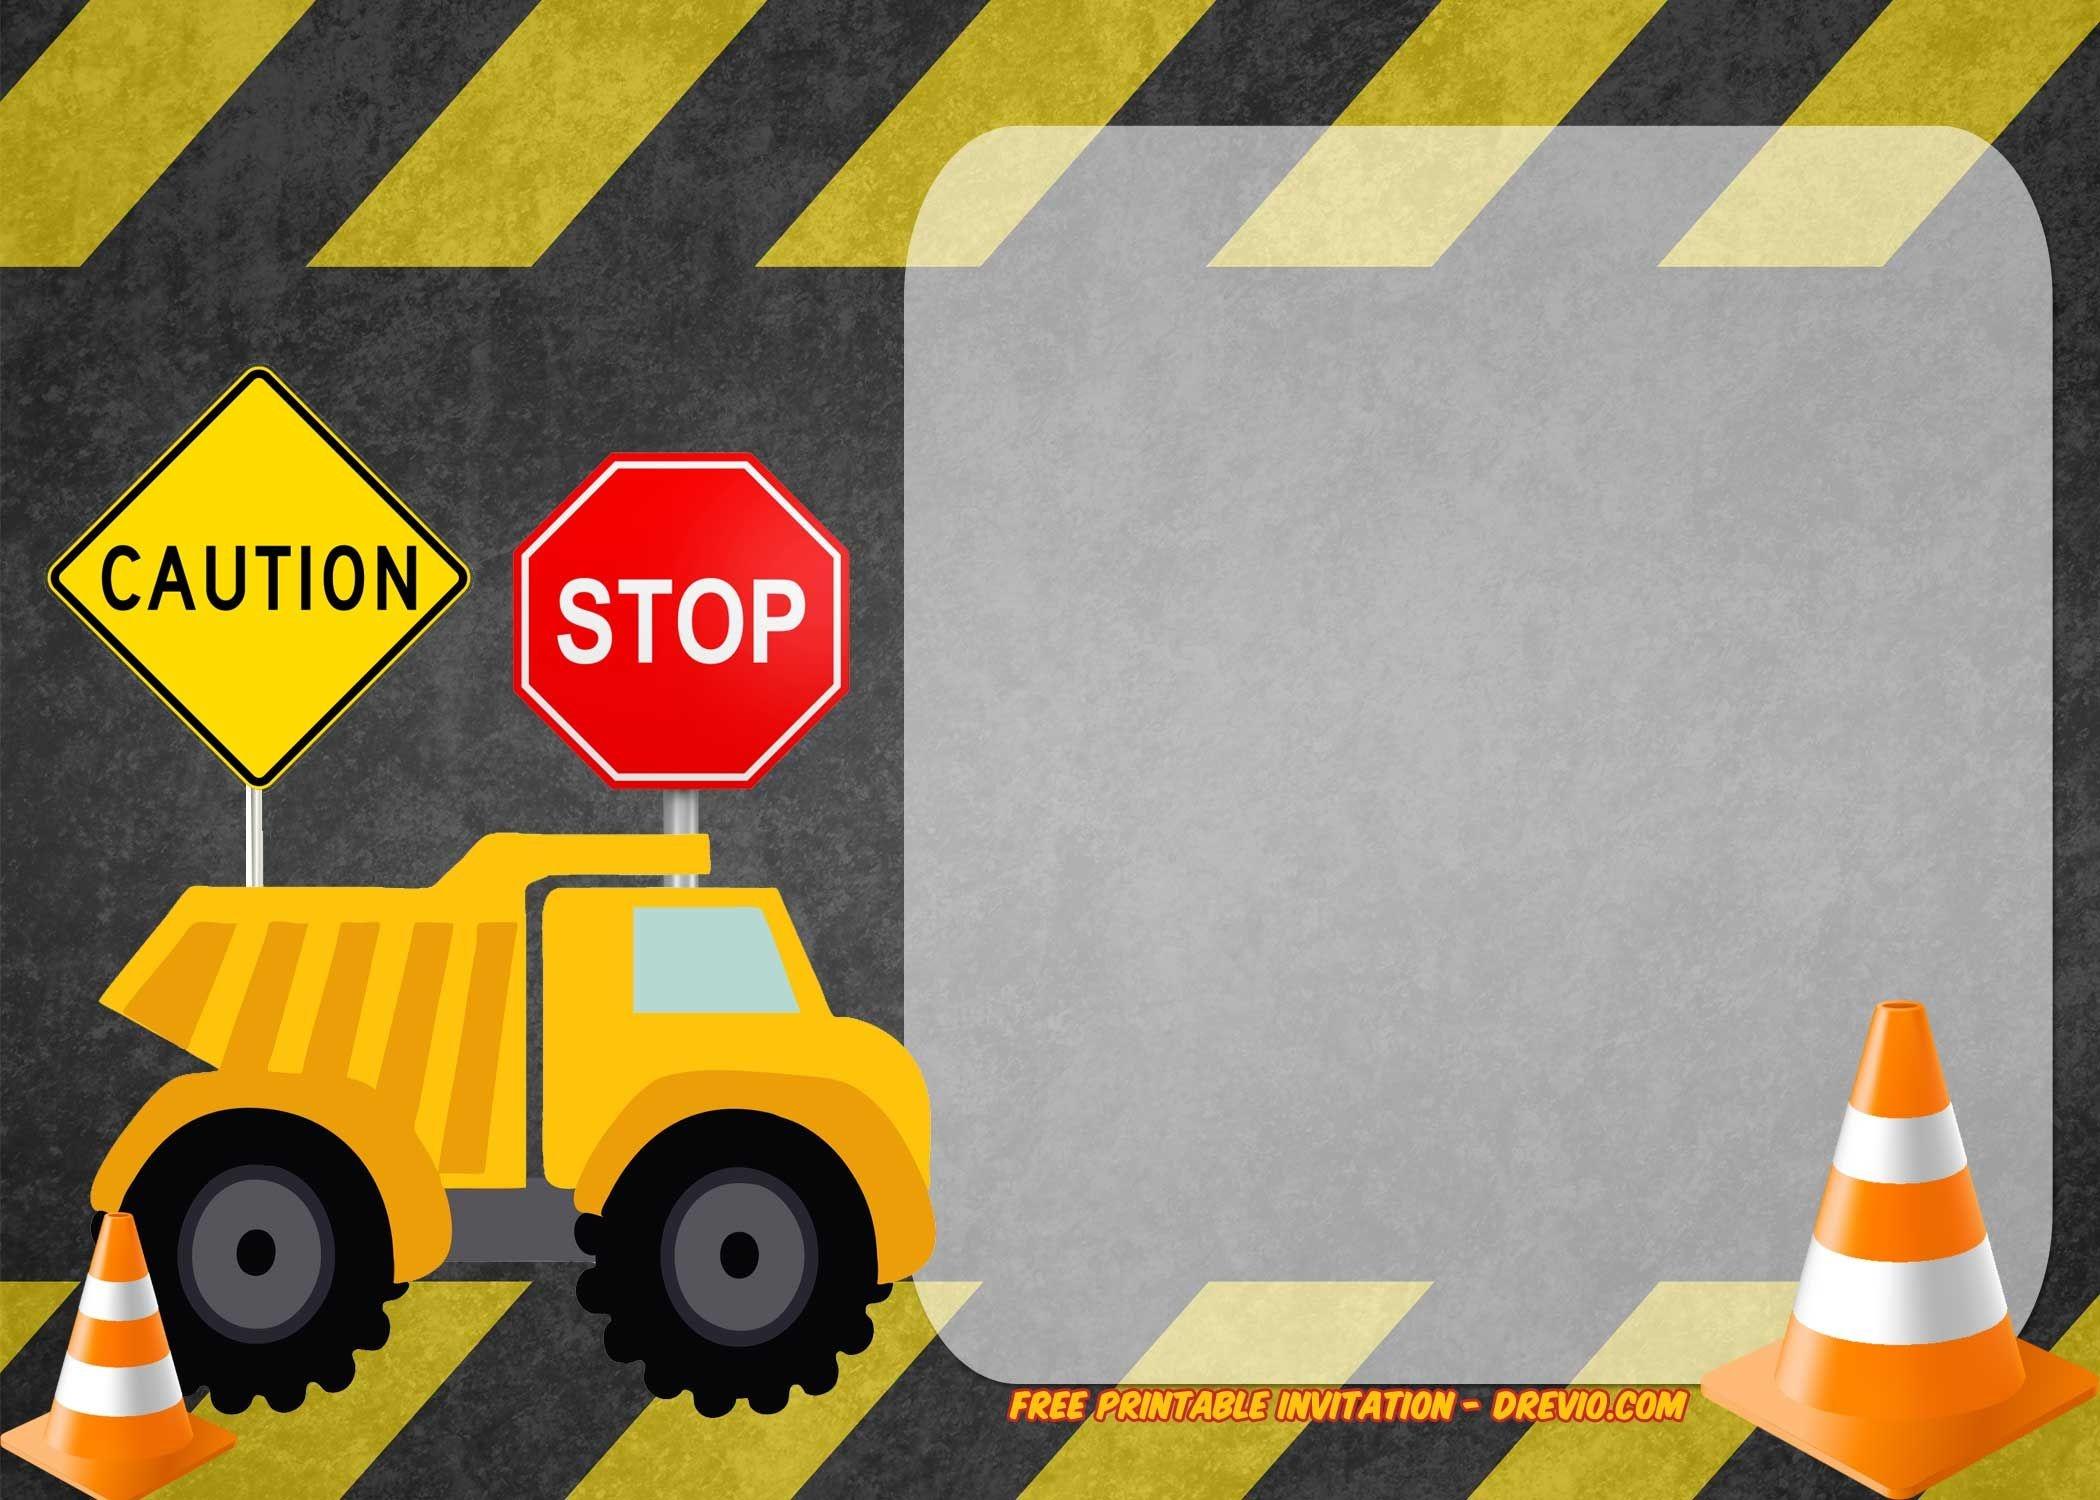 Free Printable Construction Vehicles Birthday Invitation | Party - Free Printable Construction Invitations